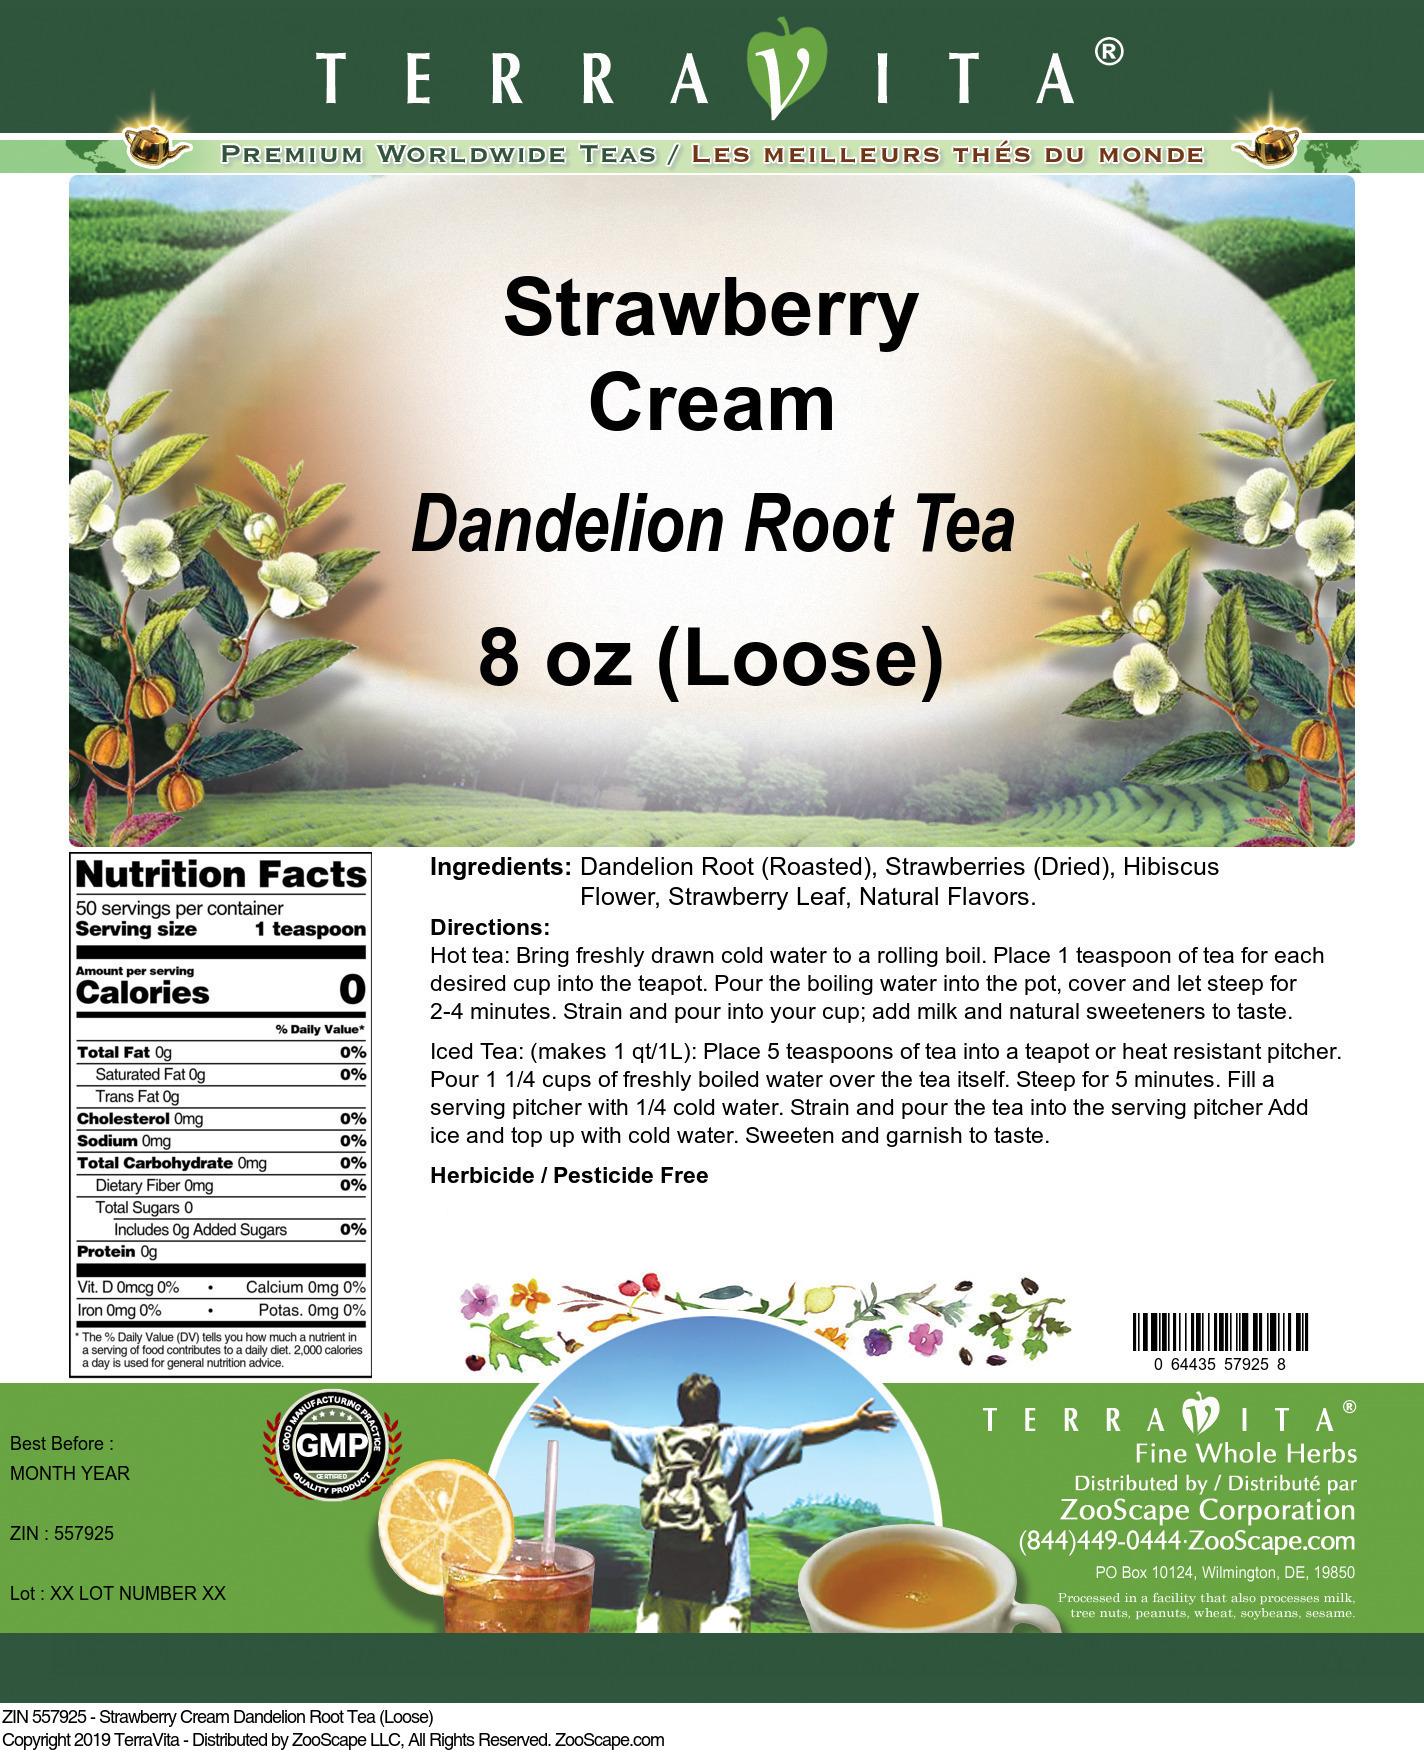 Strawberry Cream Dandelion Root Tea (Loose)